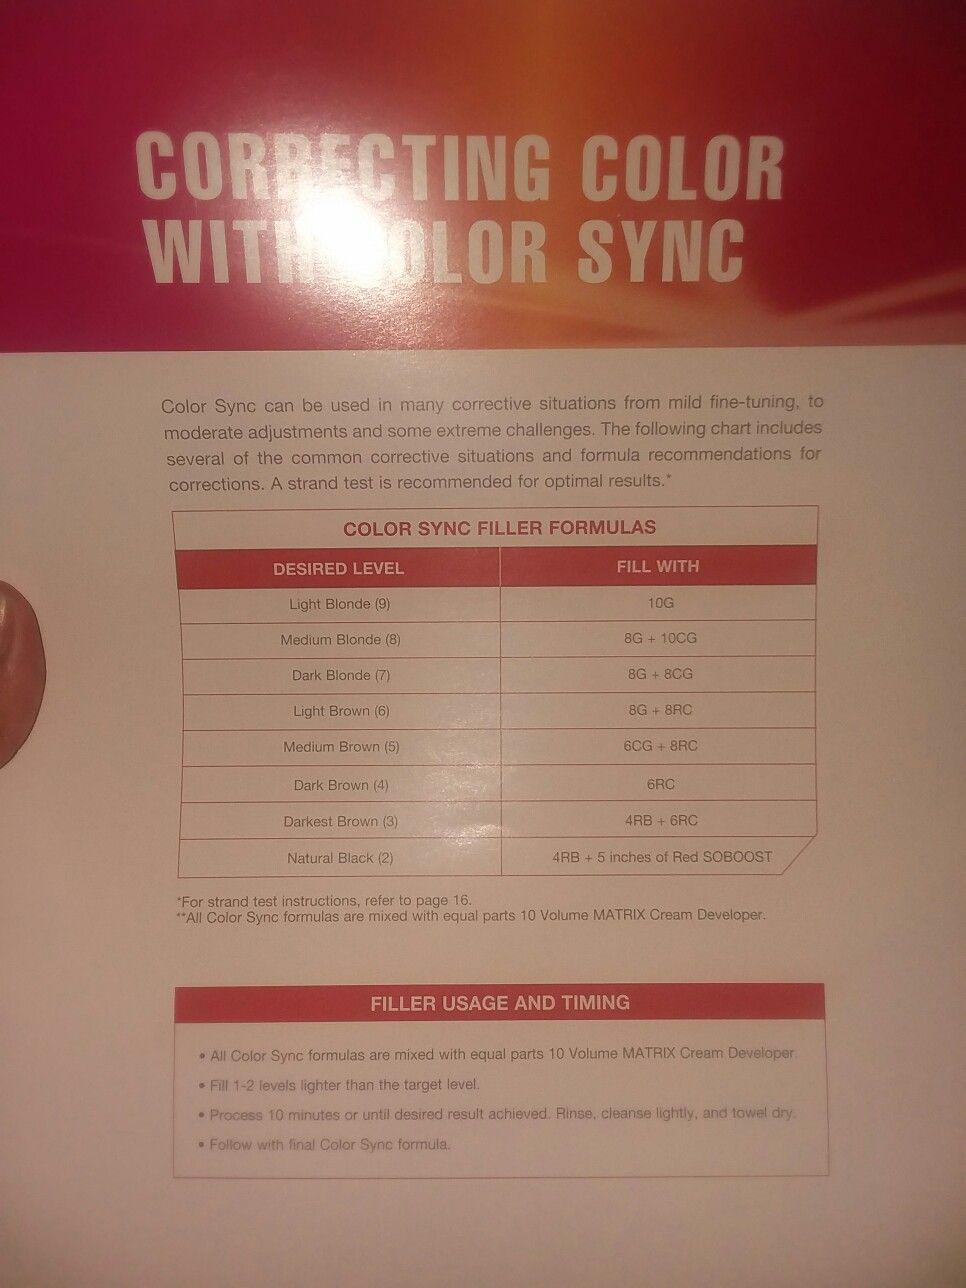 Matrix Color Sync Hair Color Correcting Color Correcting Hair Matrix Sync In 2020 Matrix Color Matrix Hair Color Hair Color